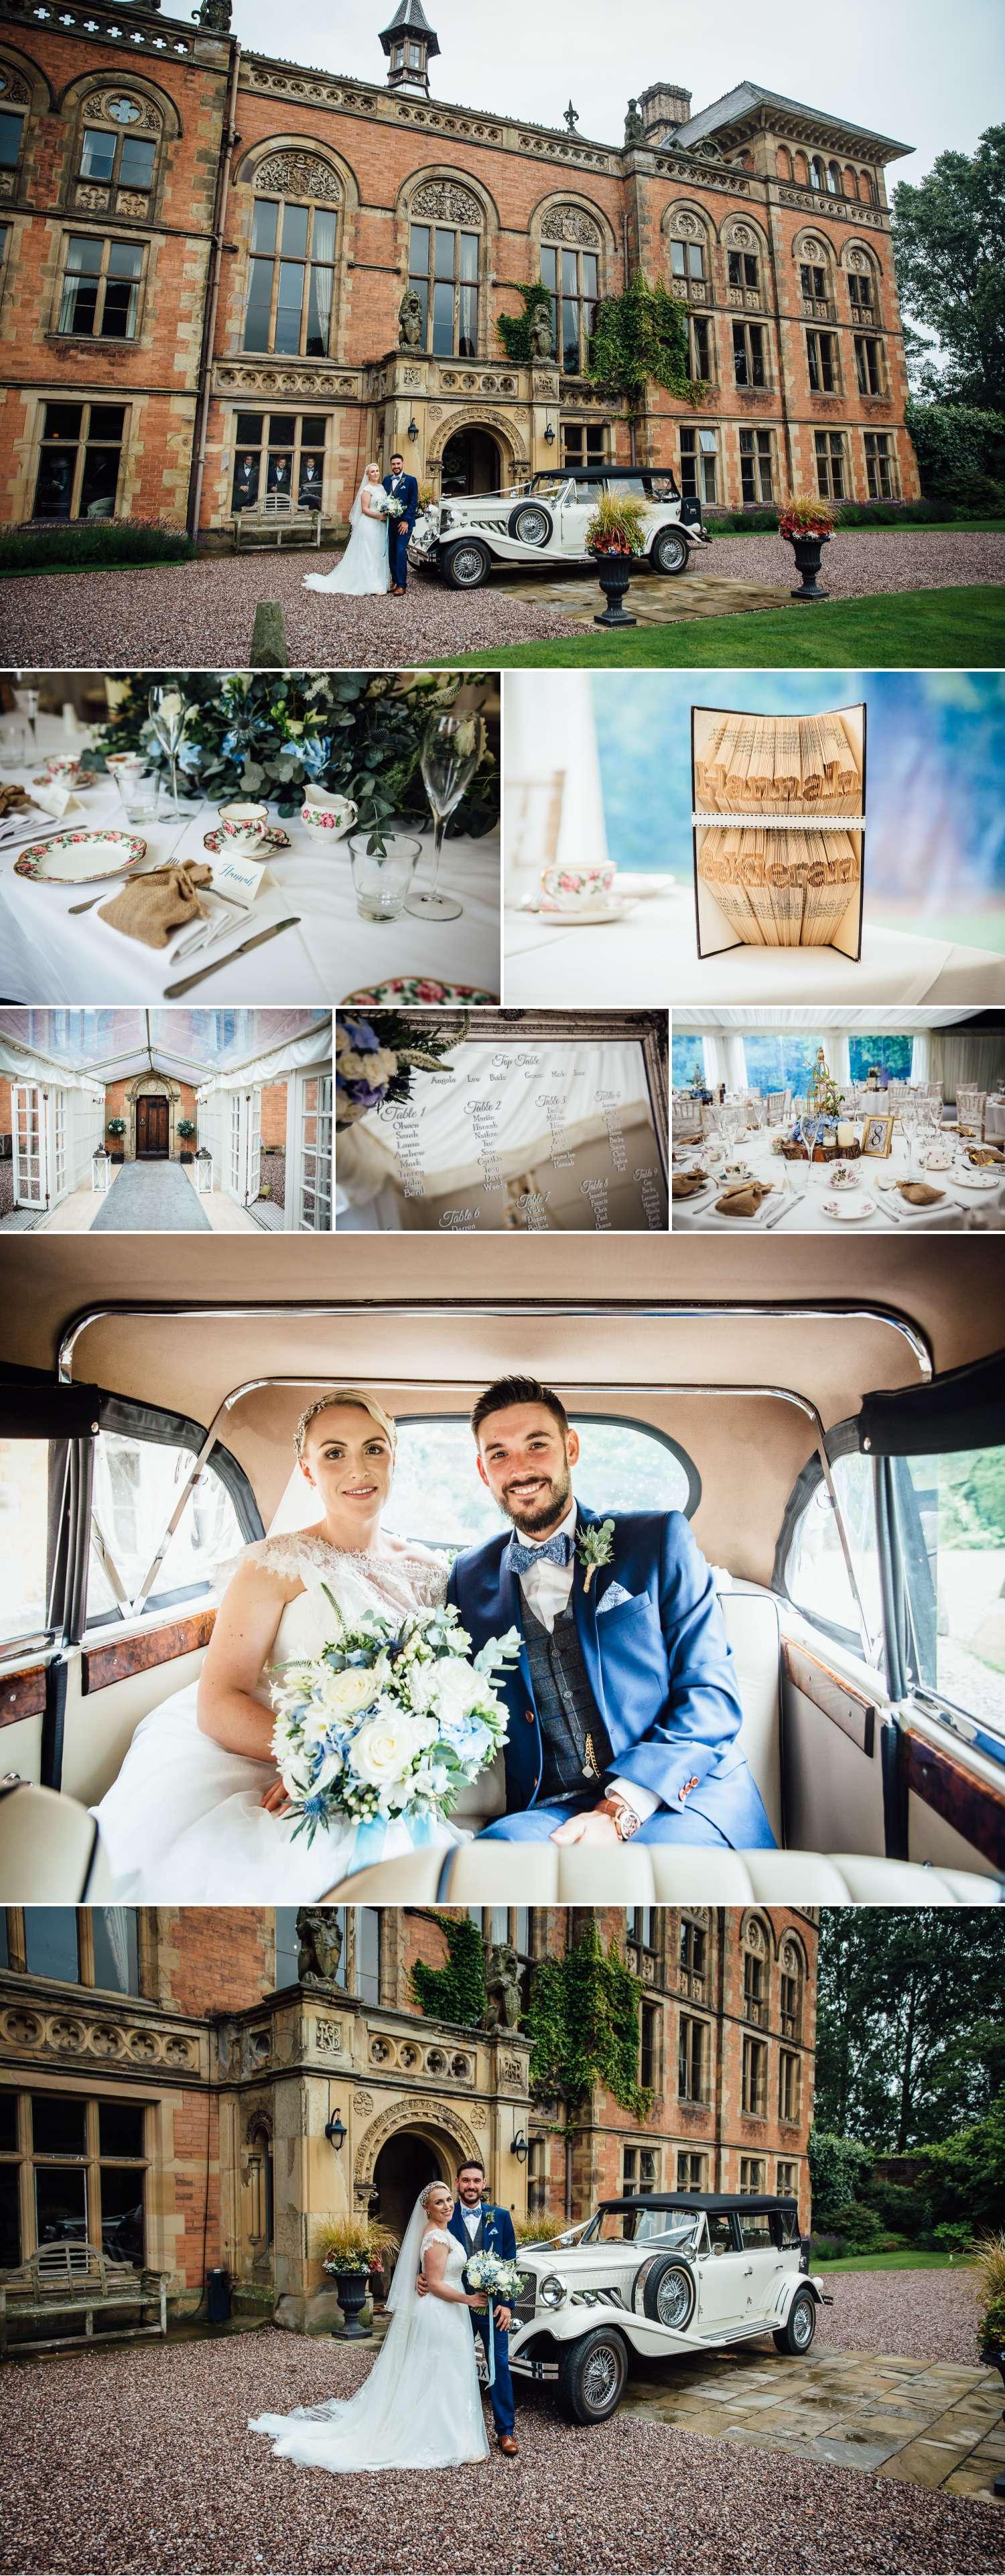 Wedding photography at Soughton Hall wedding venue